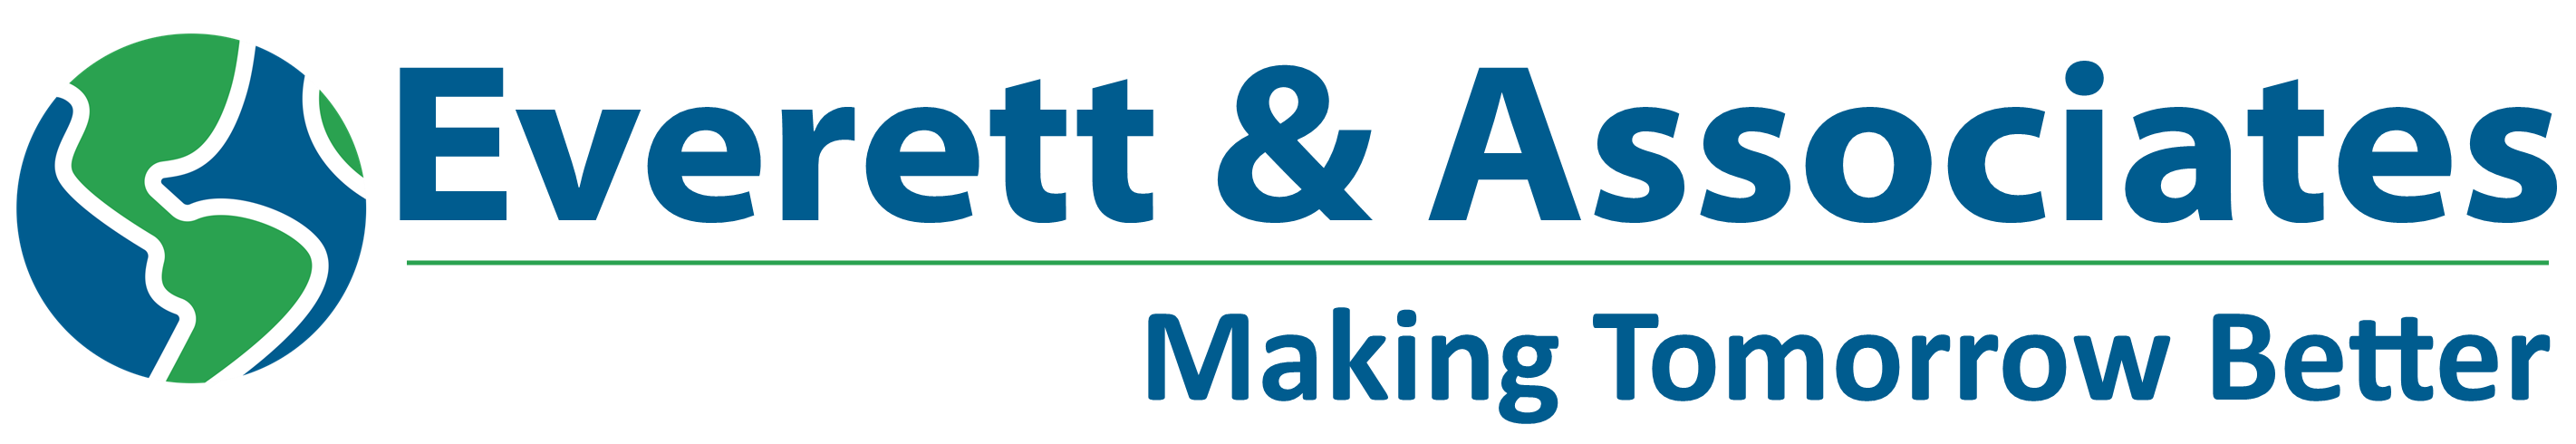 Everett & Associates